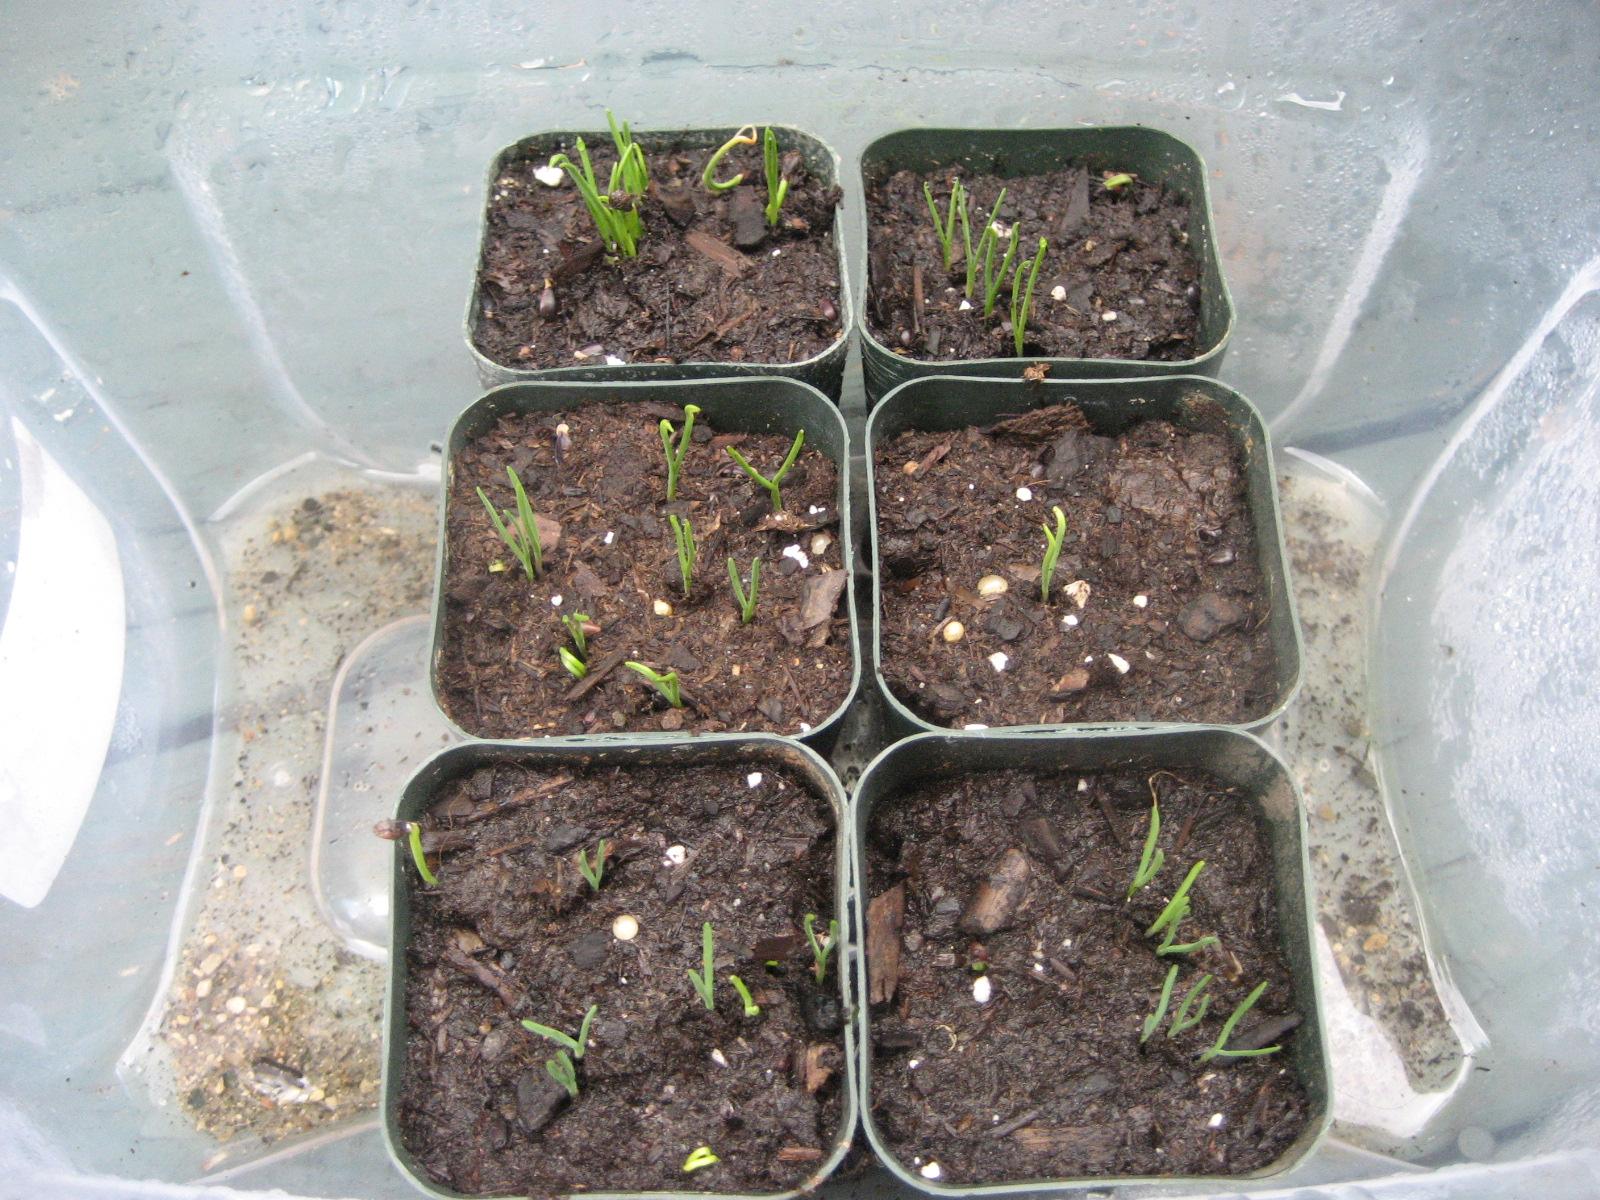 Ephedra Sinica aka Ma huang Grow Log - Botanicals - Mycotopia